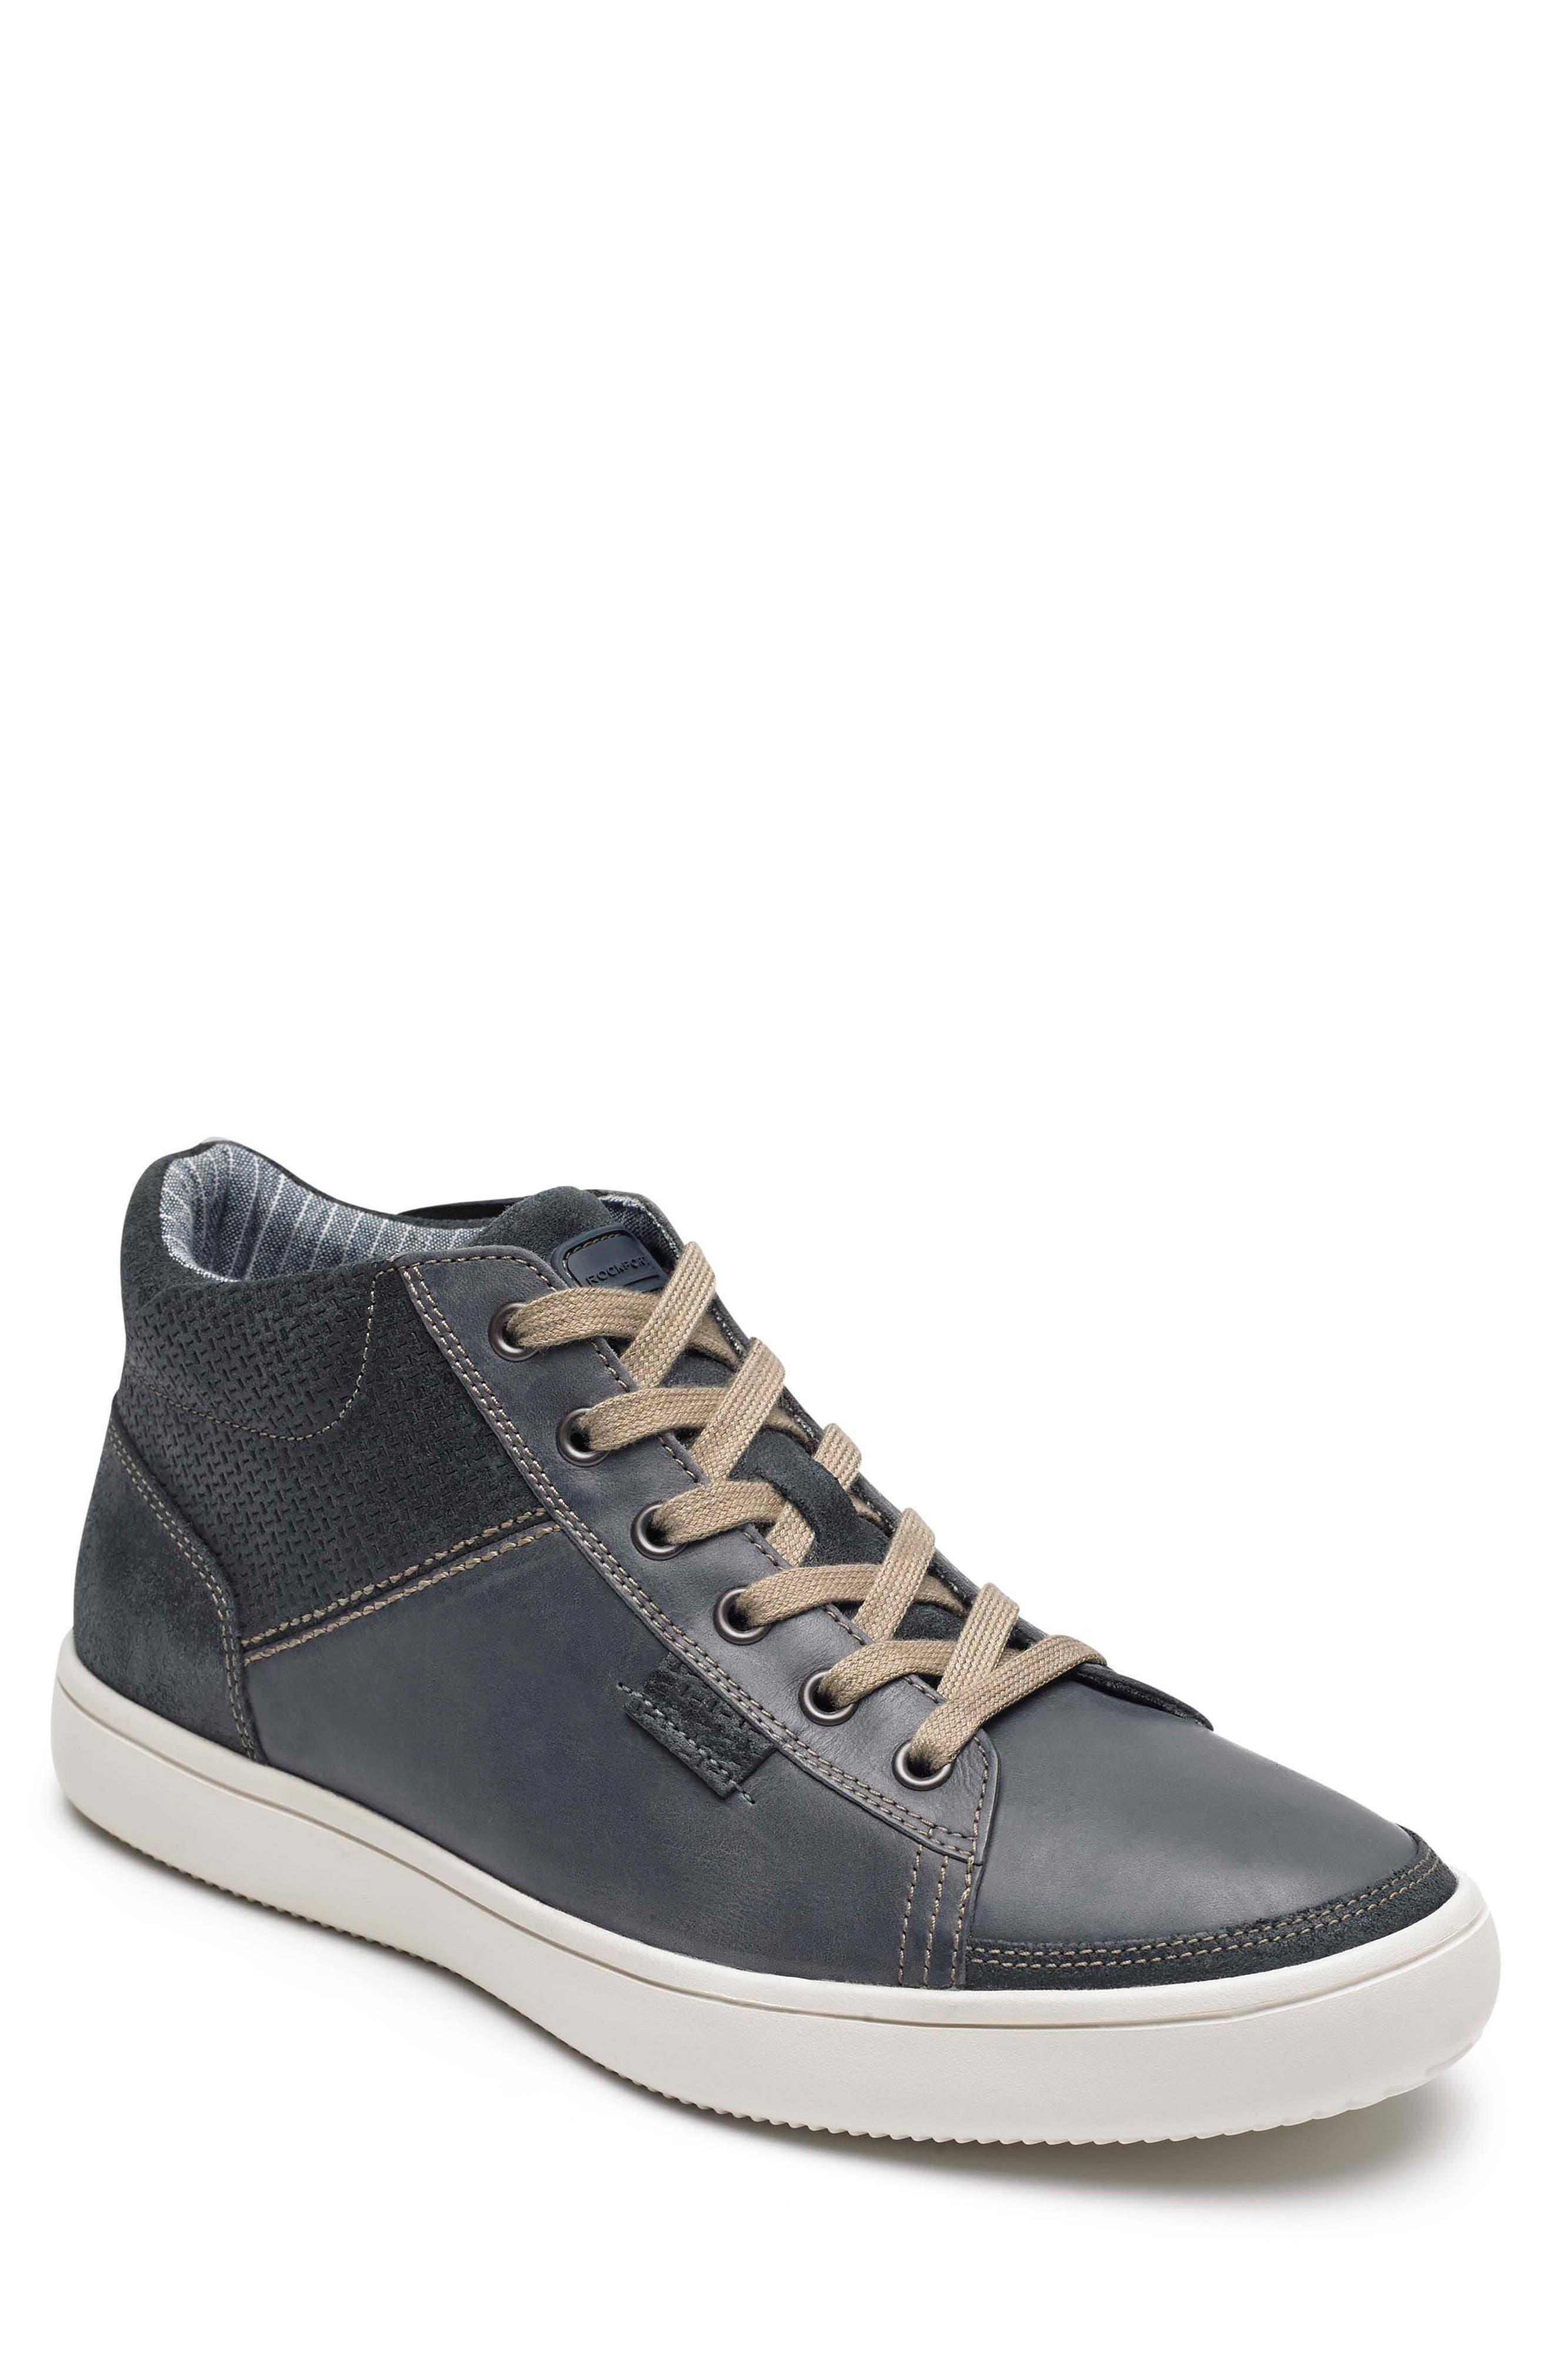 Alternate Image 1 Selected - Rockport Colle Sneaker (Men)